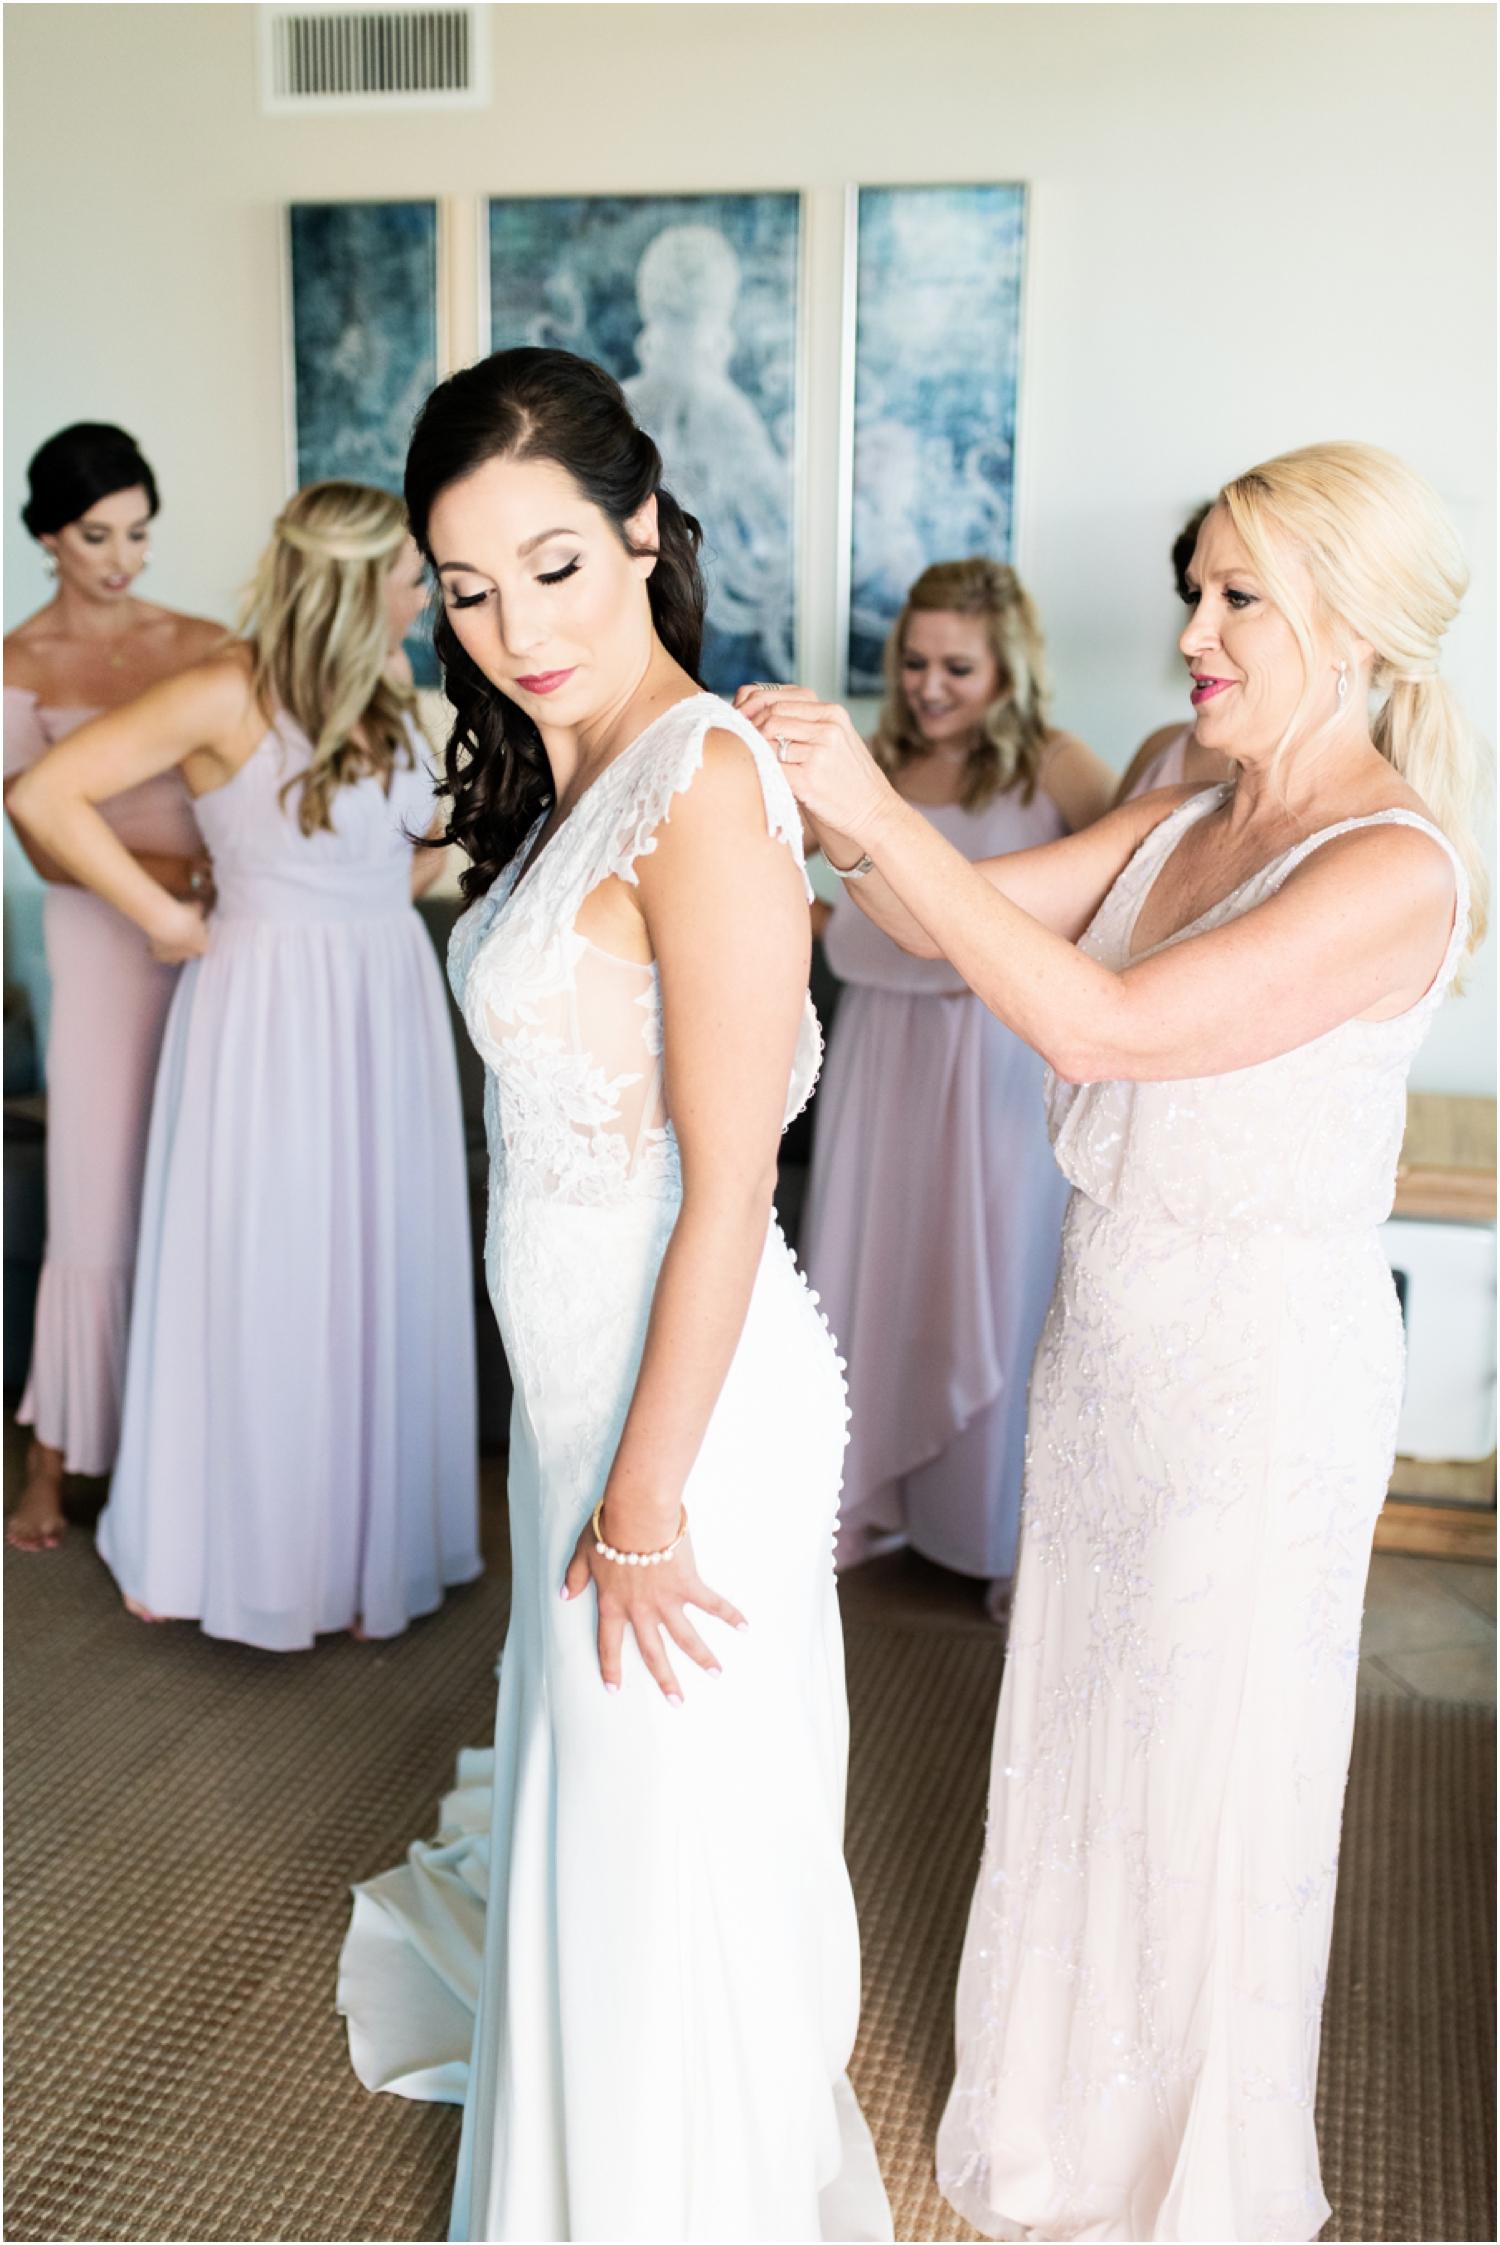 Portofino Island Resort Pensacola Beach Wedding Photographer bride bridesmaids getting ready